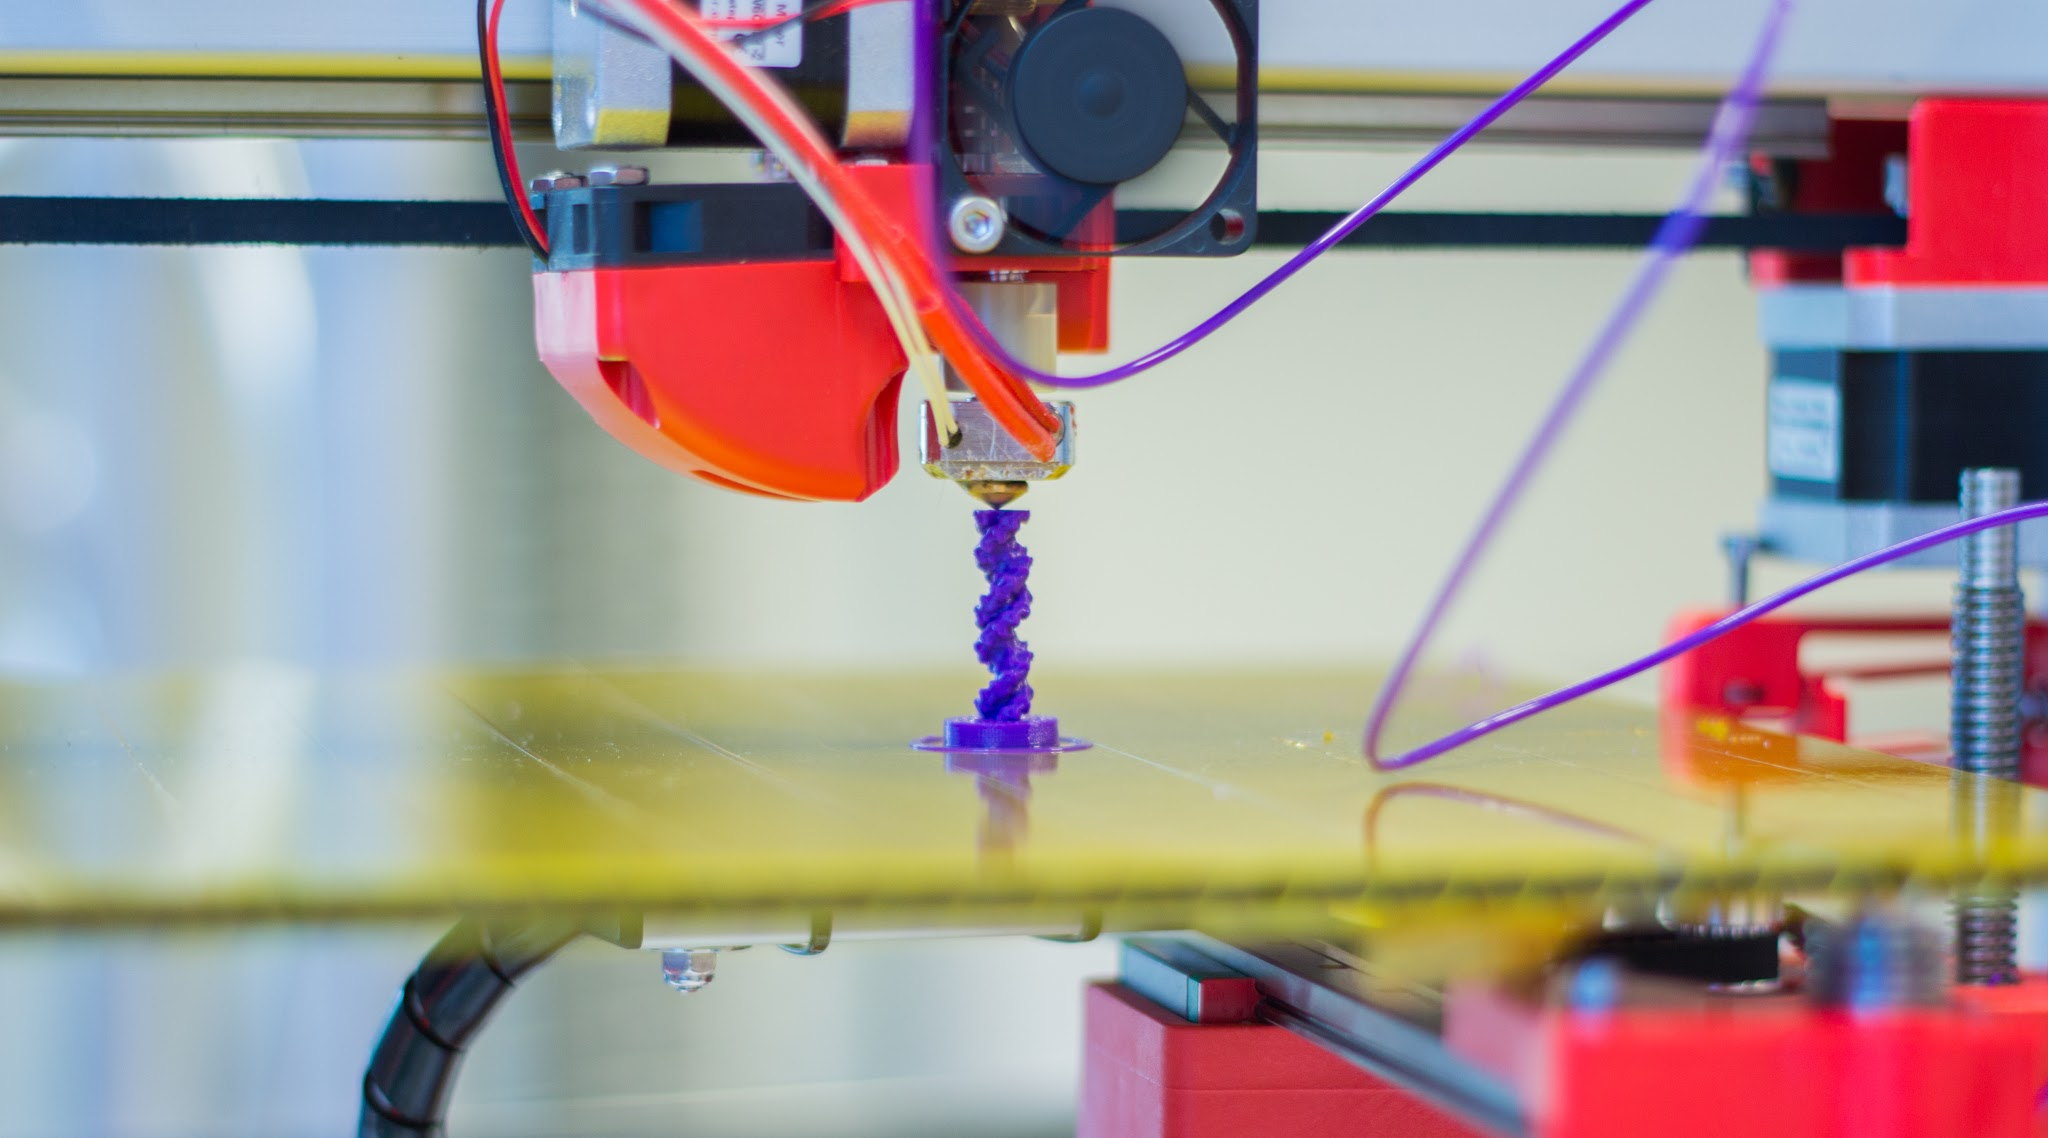 Felix 3D Printer Printing Head